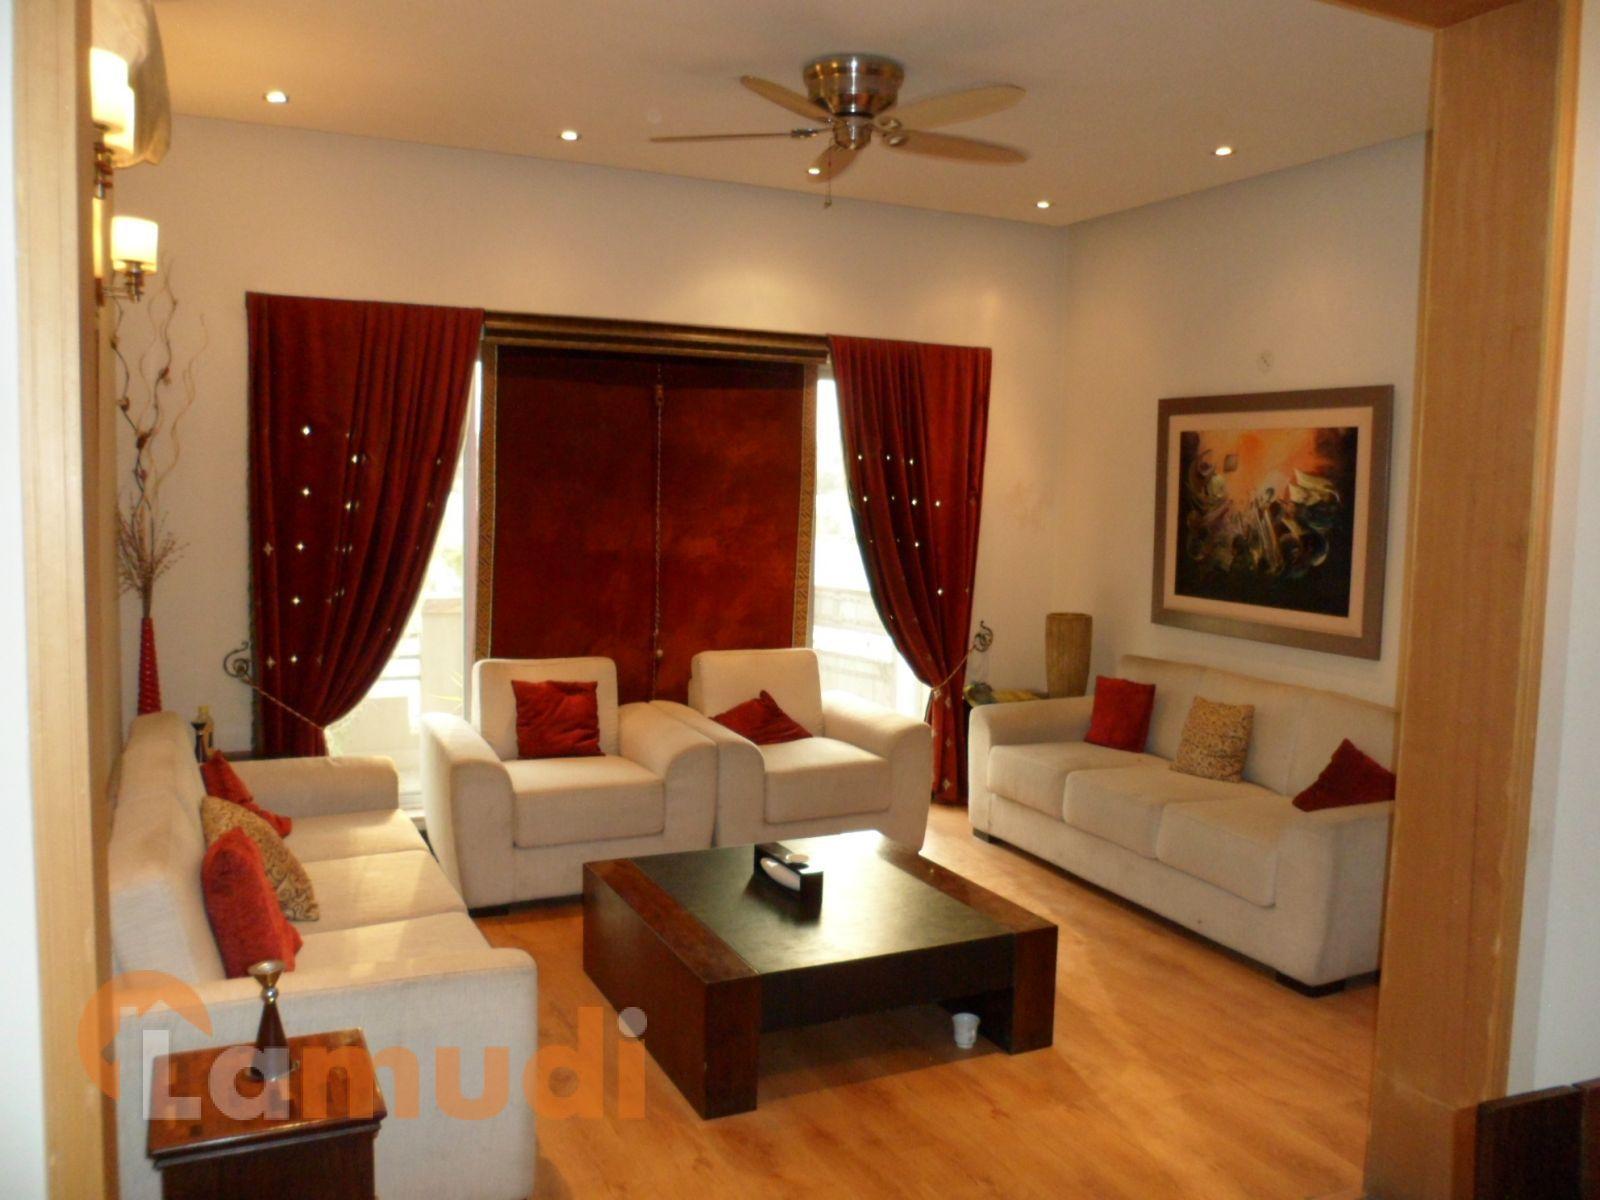 5 marla house divine garden lahore for sale lahore For5 Marla House Decoration